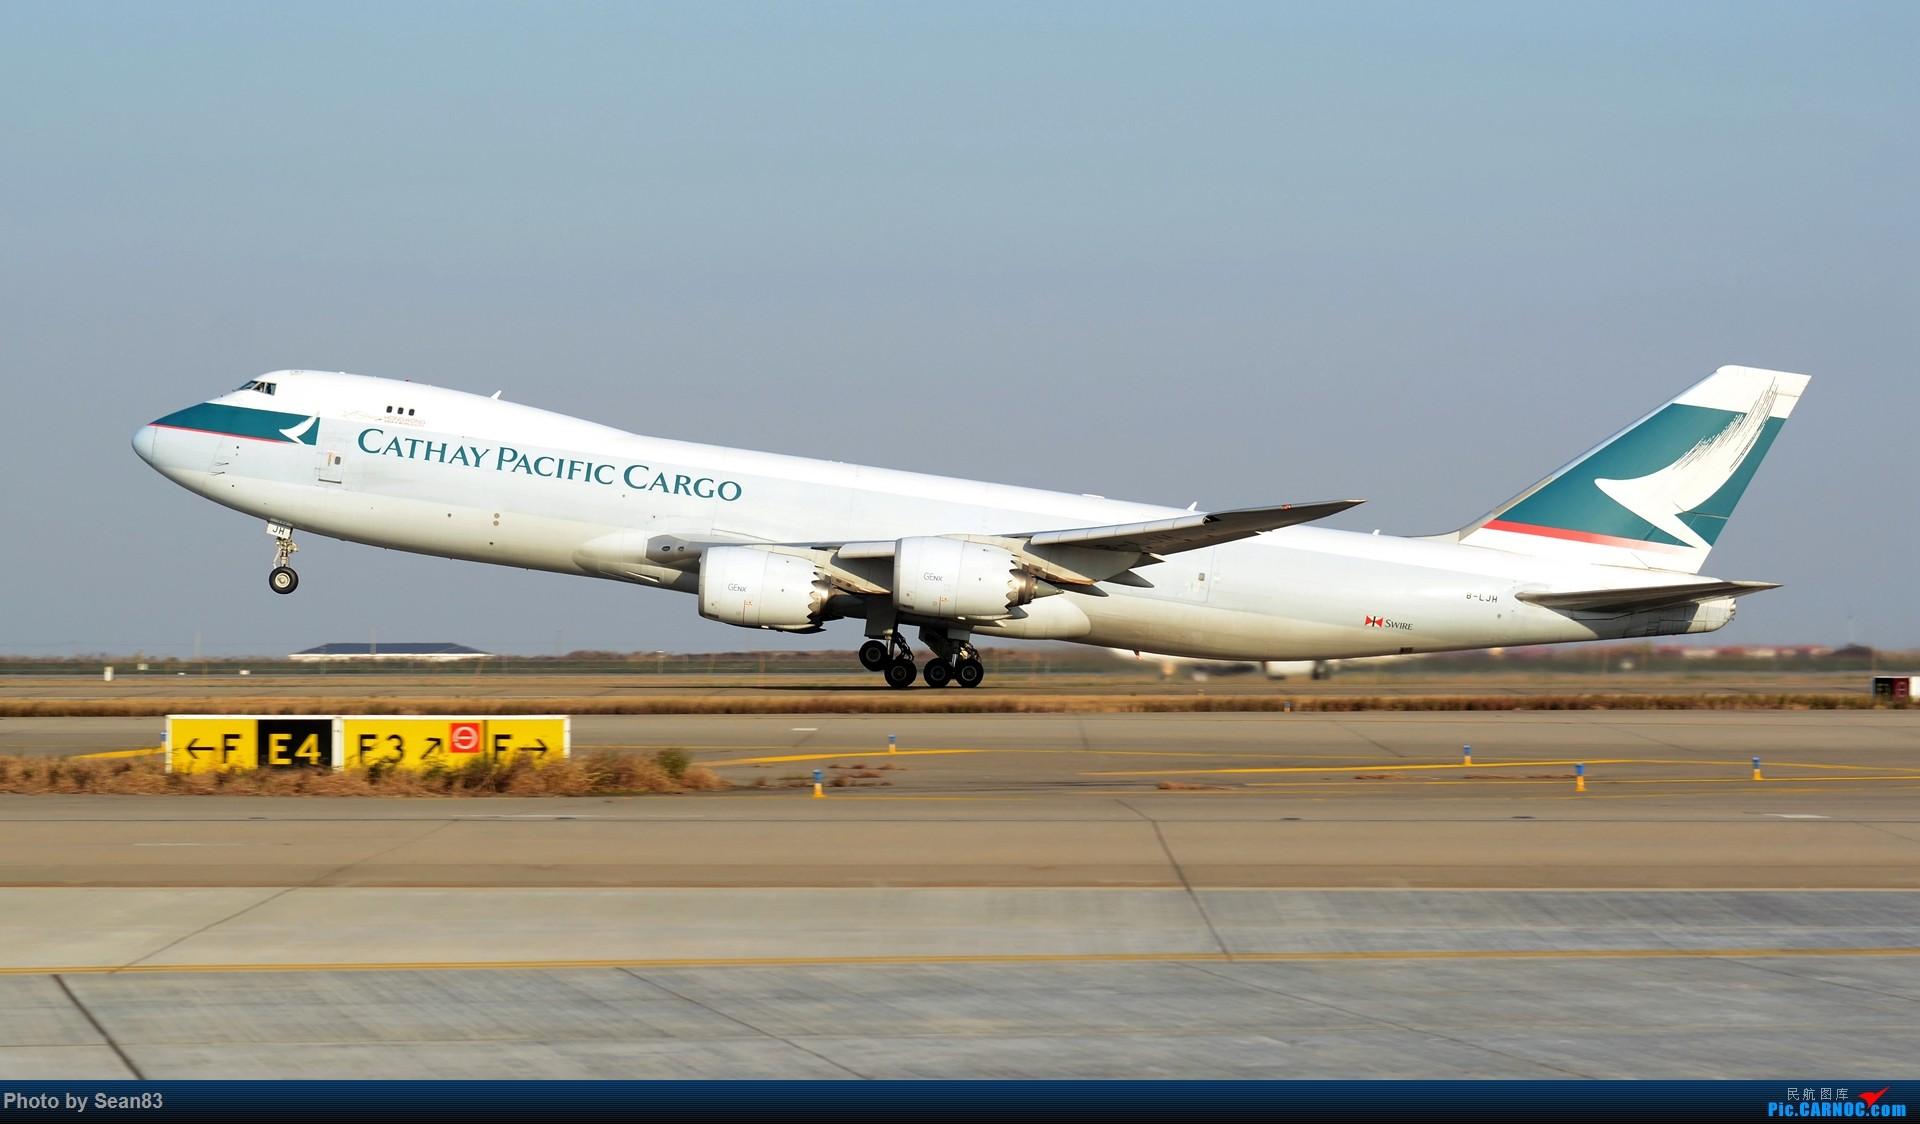 Re:[原创](1920*1080)放出一组壁纸 BOEING 747-8F B-LJH 上海浦东国际机场